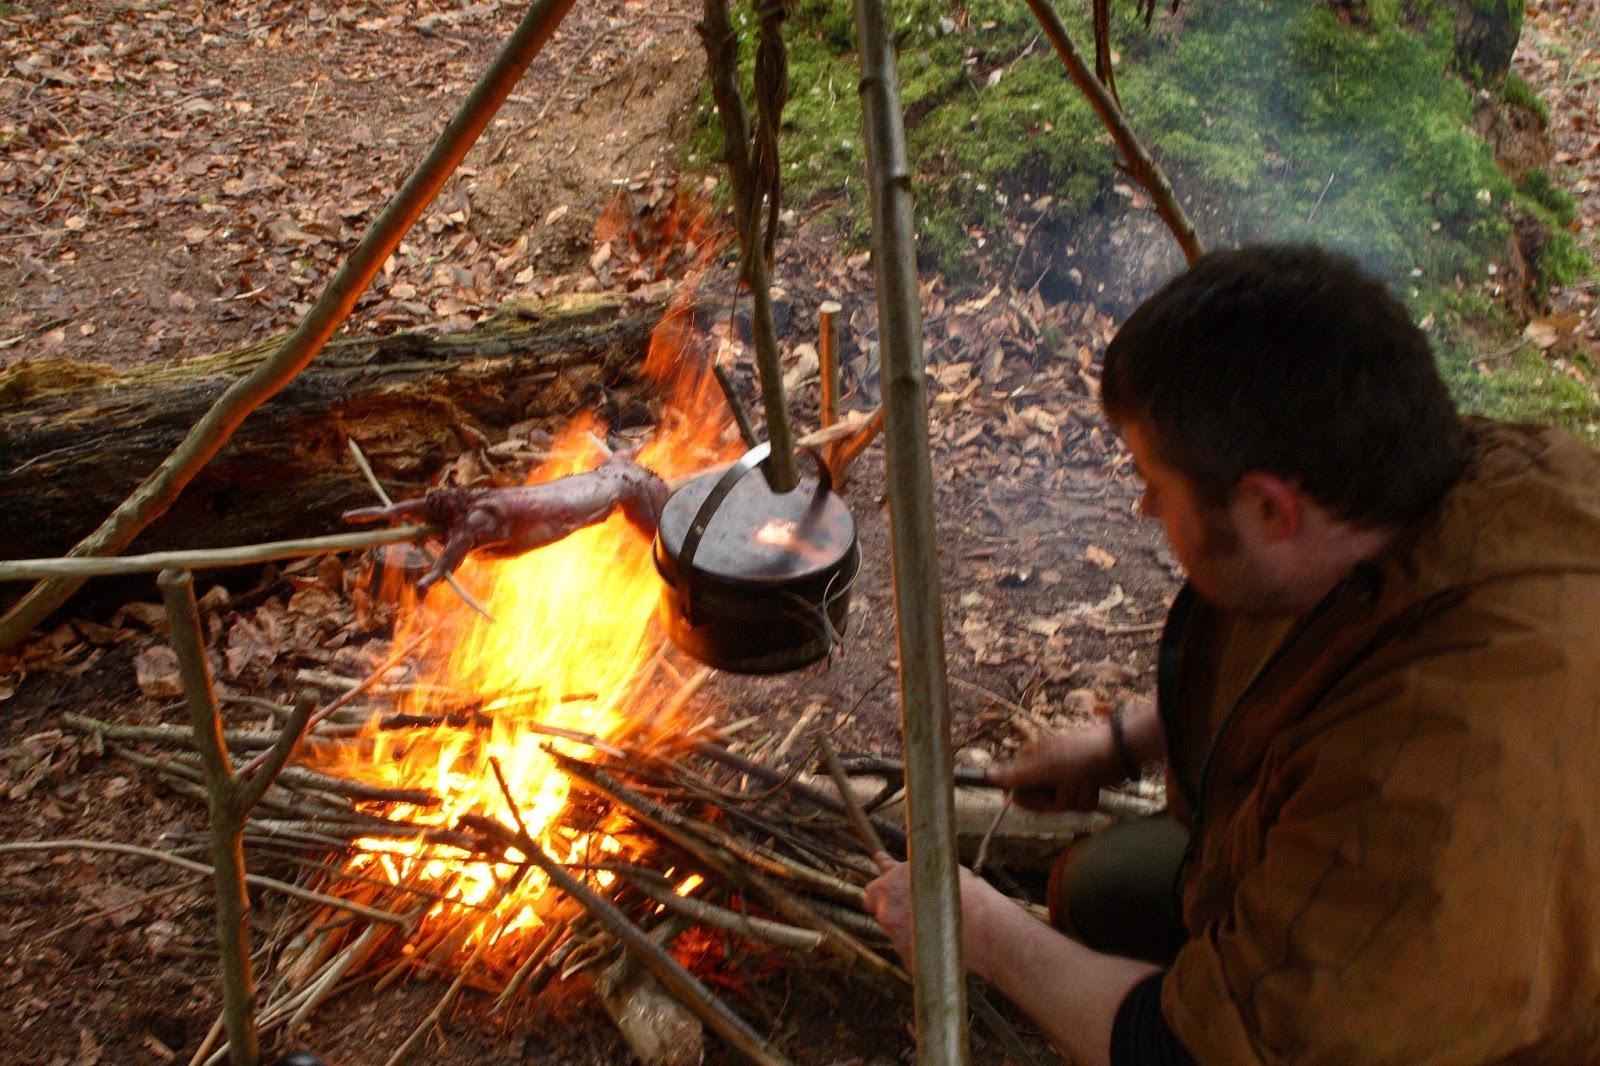 Wilderness Survival Skills And Bushcraft Antics Fire